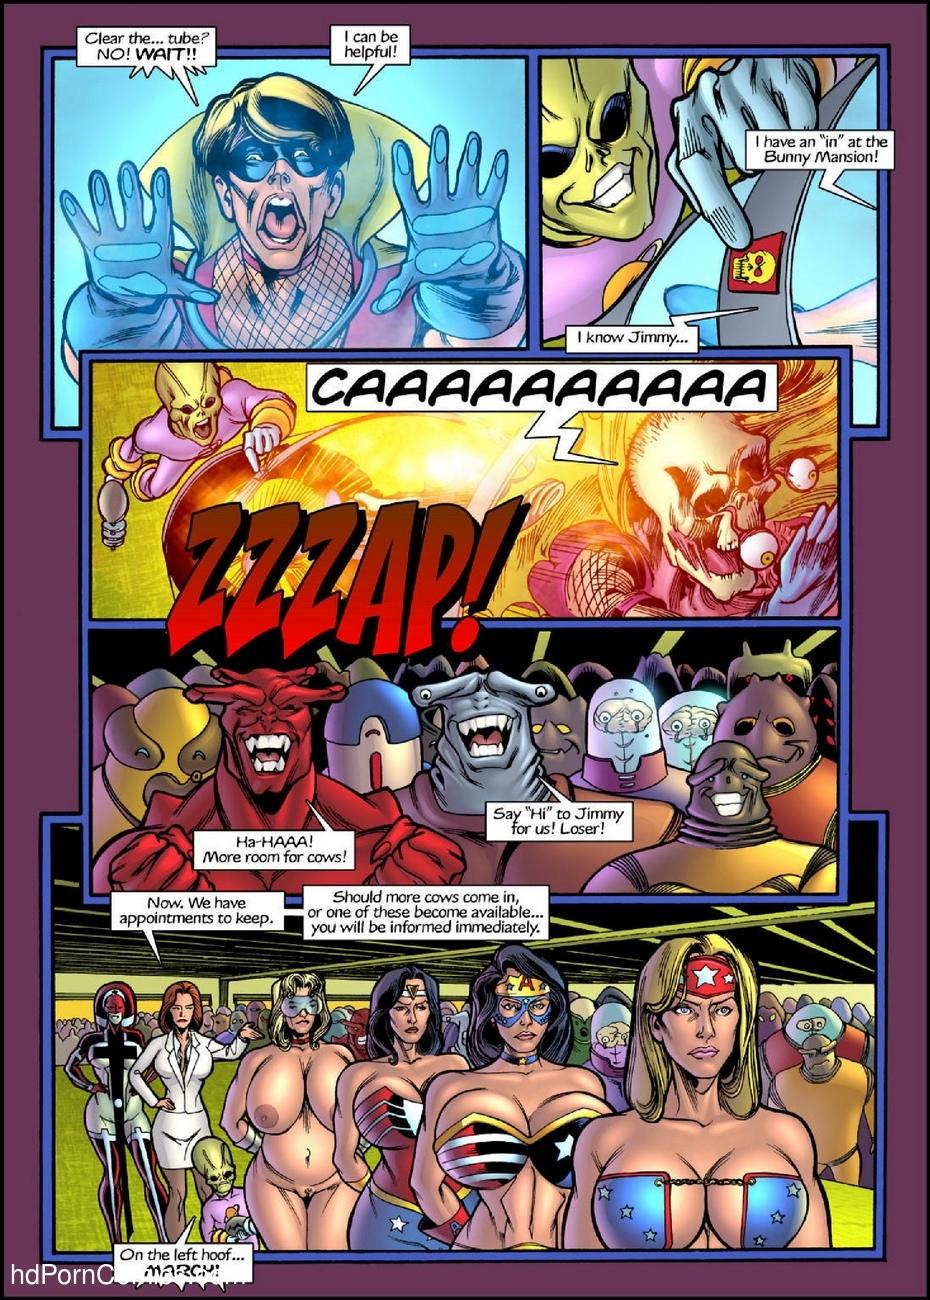 Freedom Stars - Cattle Call 1 34 free sex comic